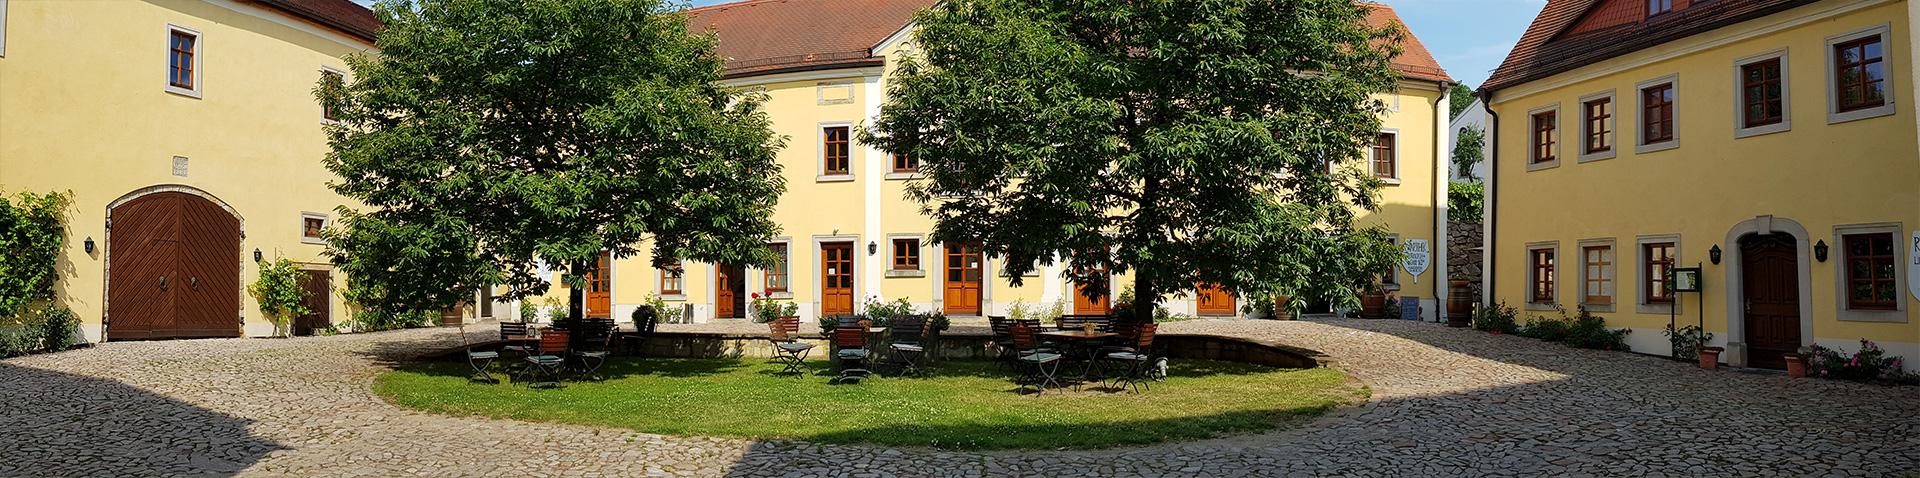 Weingutshof in Zadel